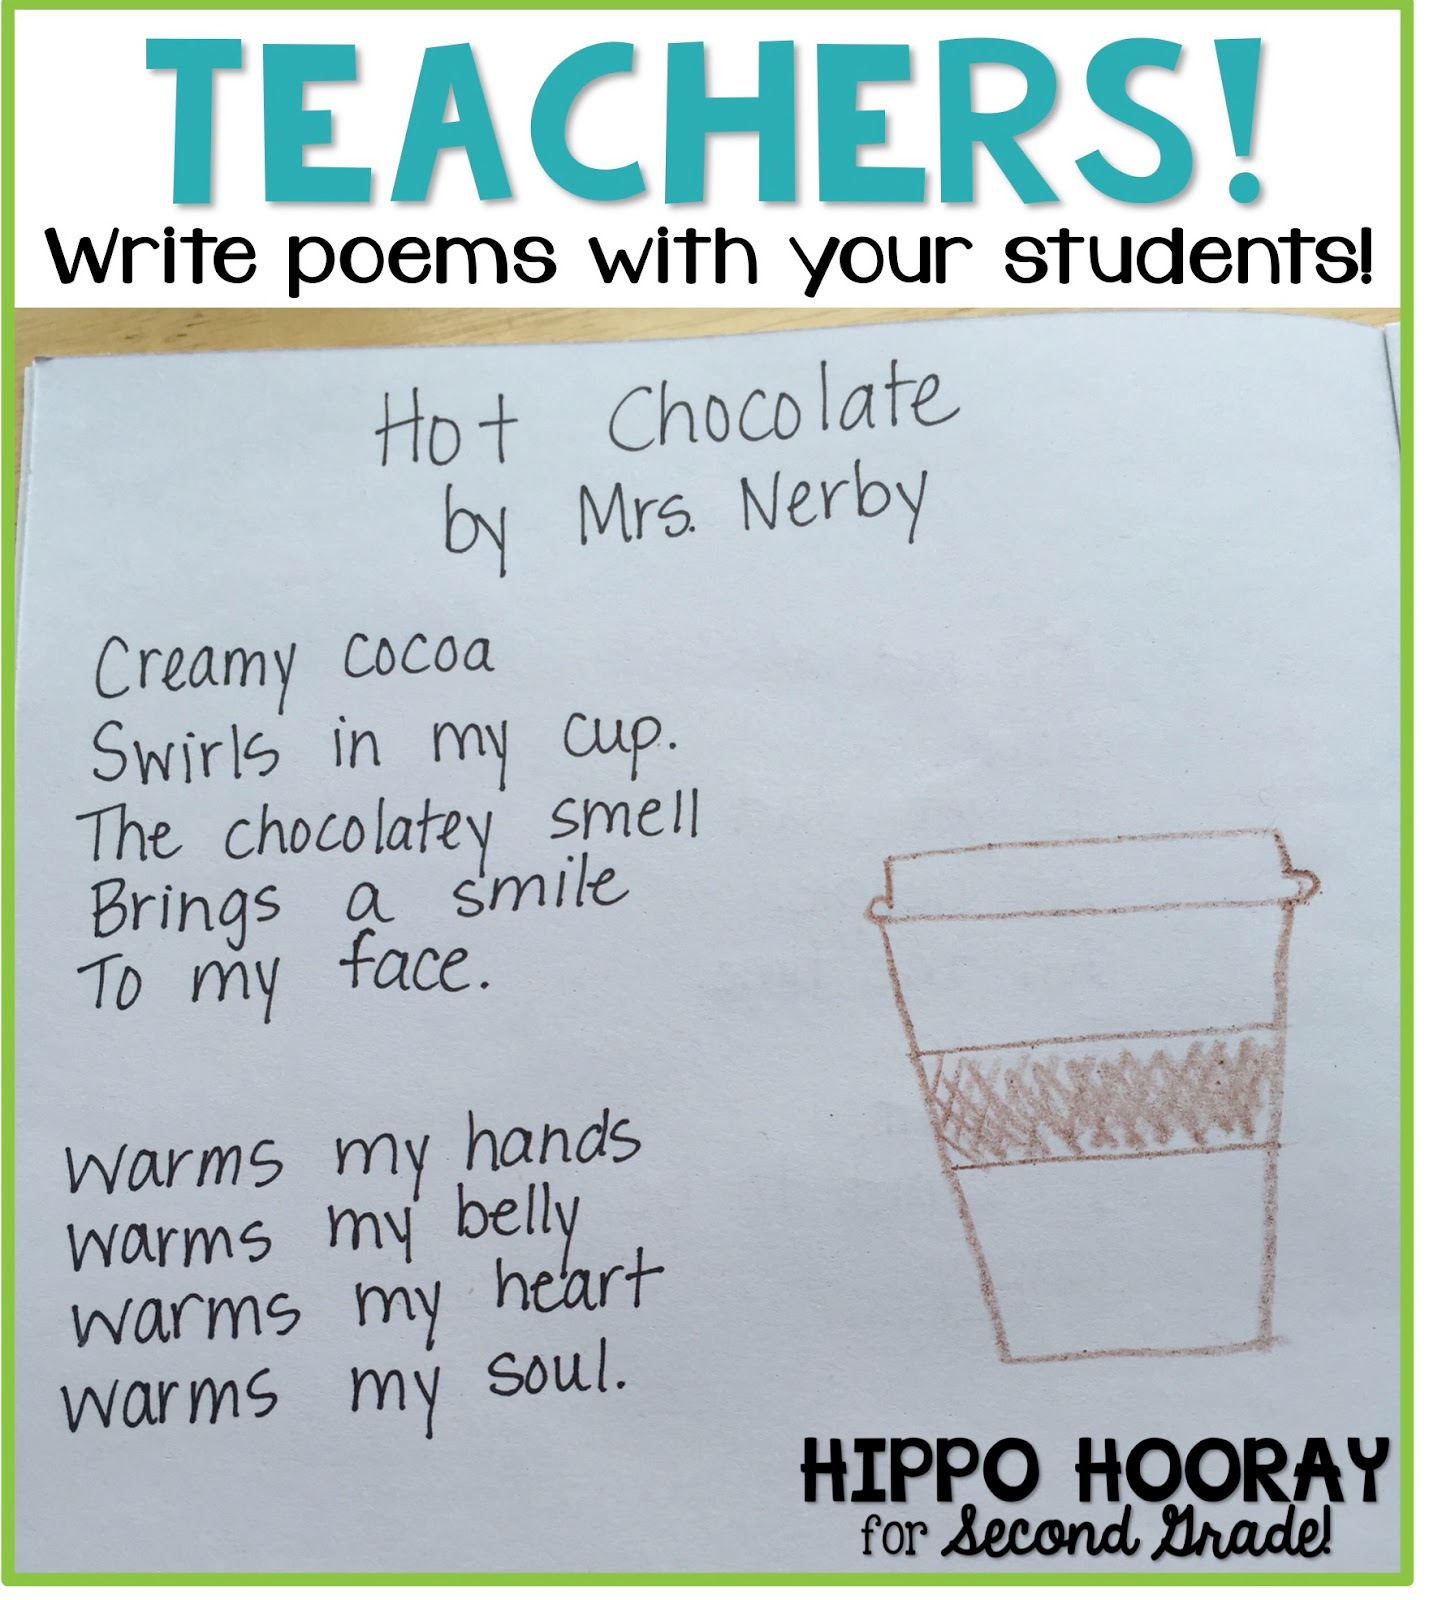 hight resolution of Beyond Acrostics \u0026 Haiku: Teaching Poetry - Hippo Hooray for Second Grade!